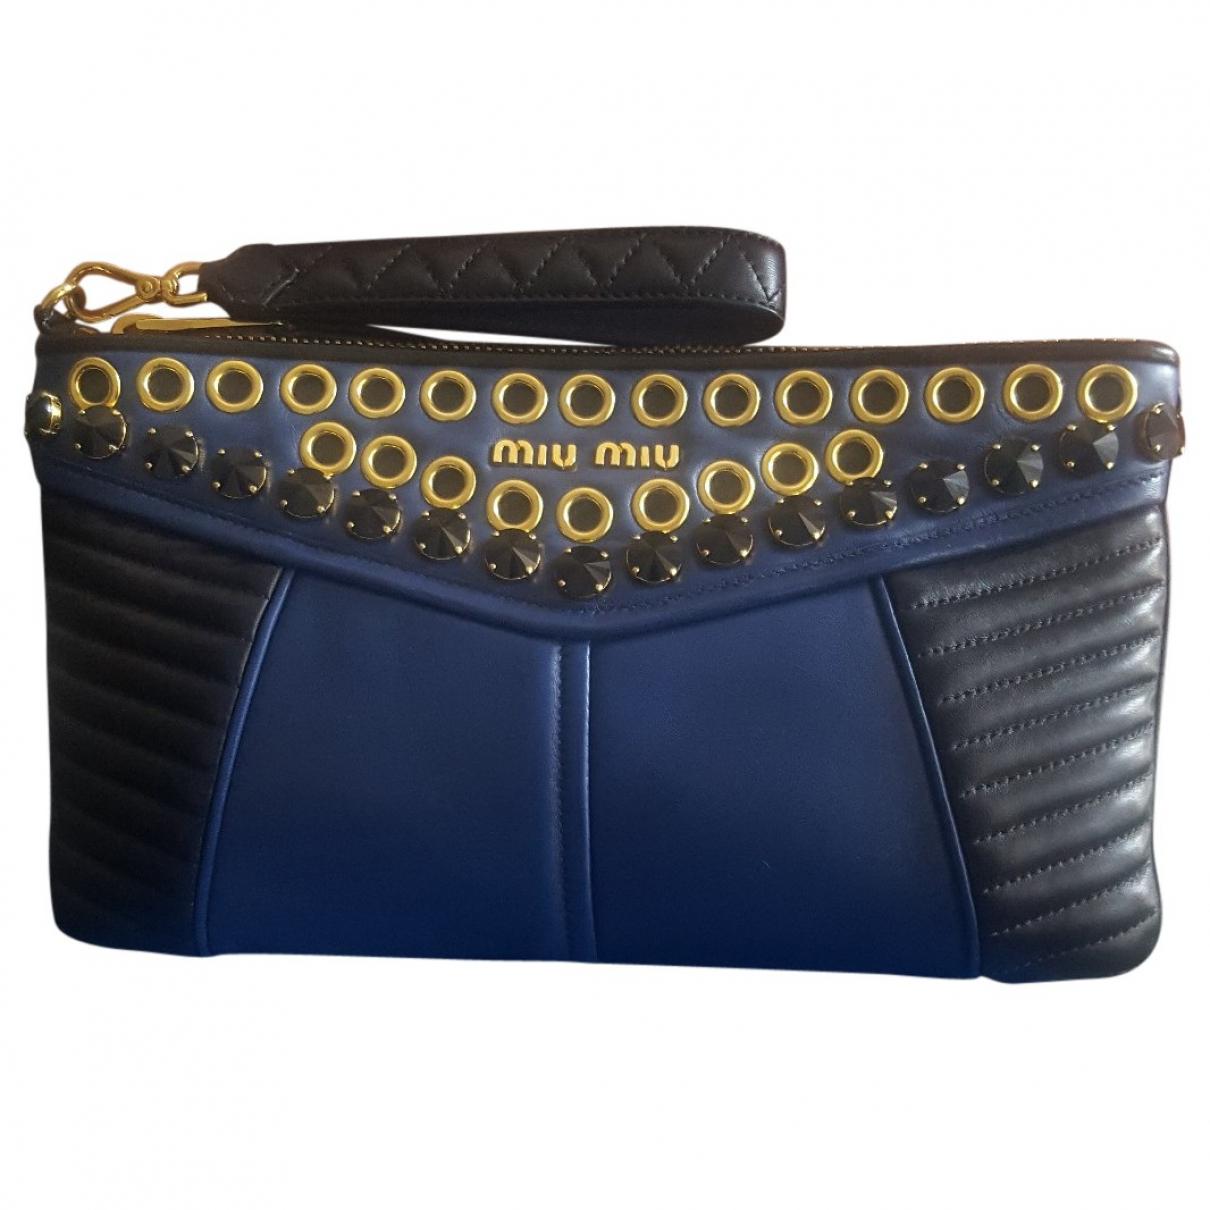 Miu Miu \N Blue Leather Clutch bag for Women \N